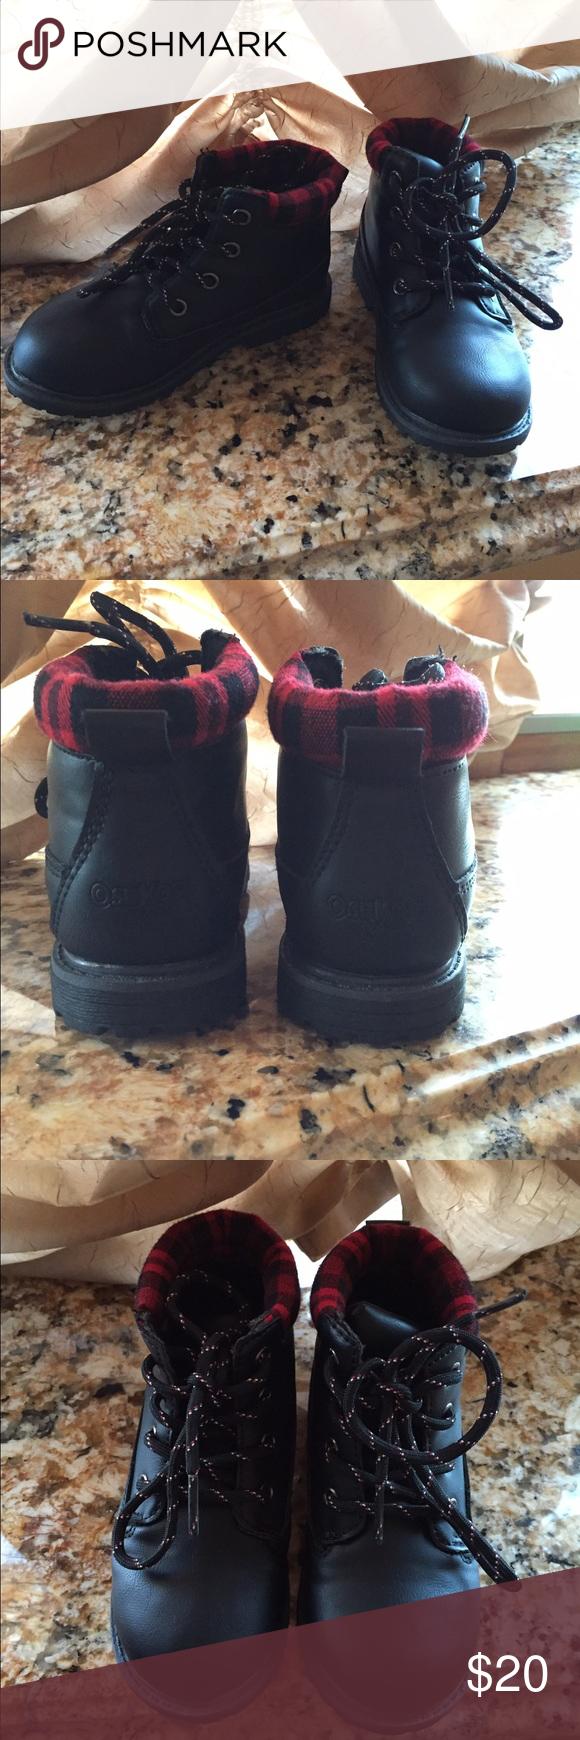 Oshkosh Braxton-B Boot Great winter boot, size 9 toddler boys never worn!! Osh Kosh Shoes Boots